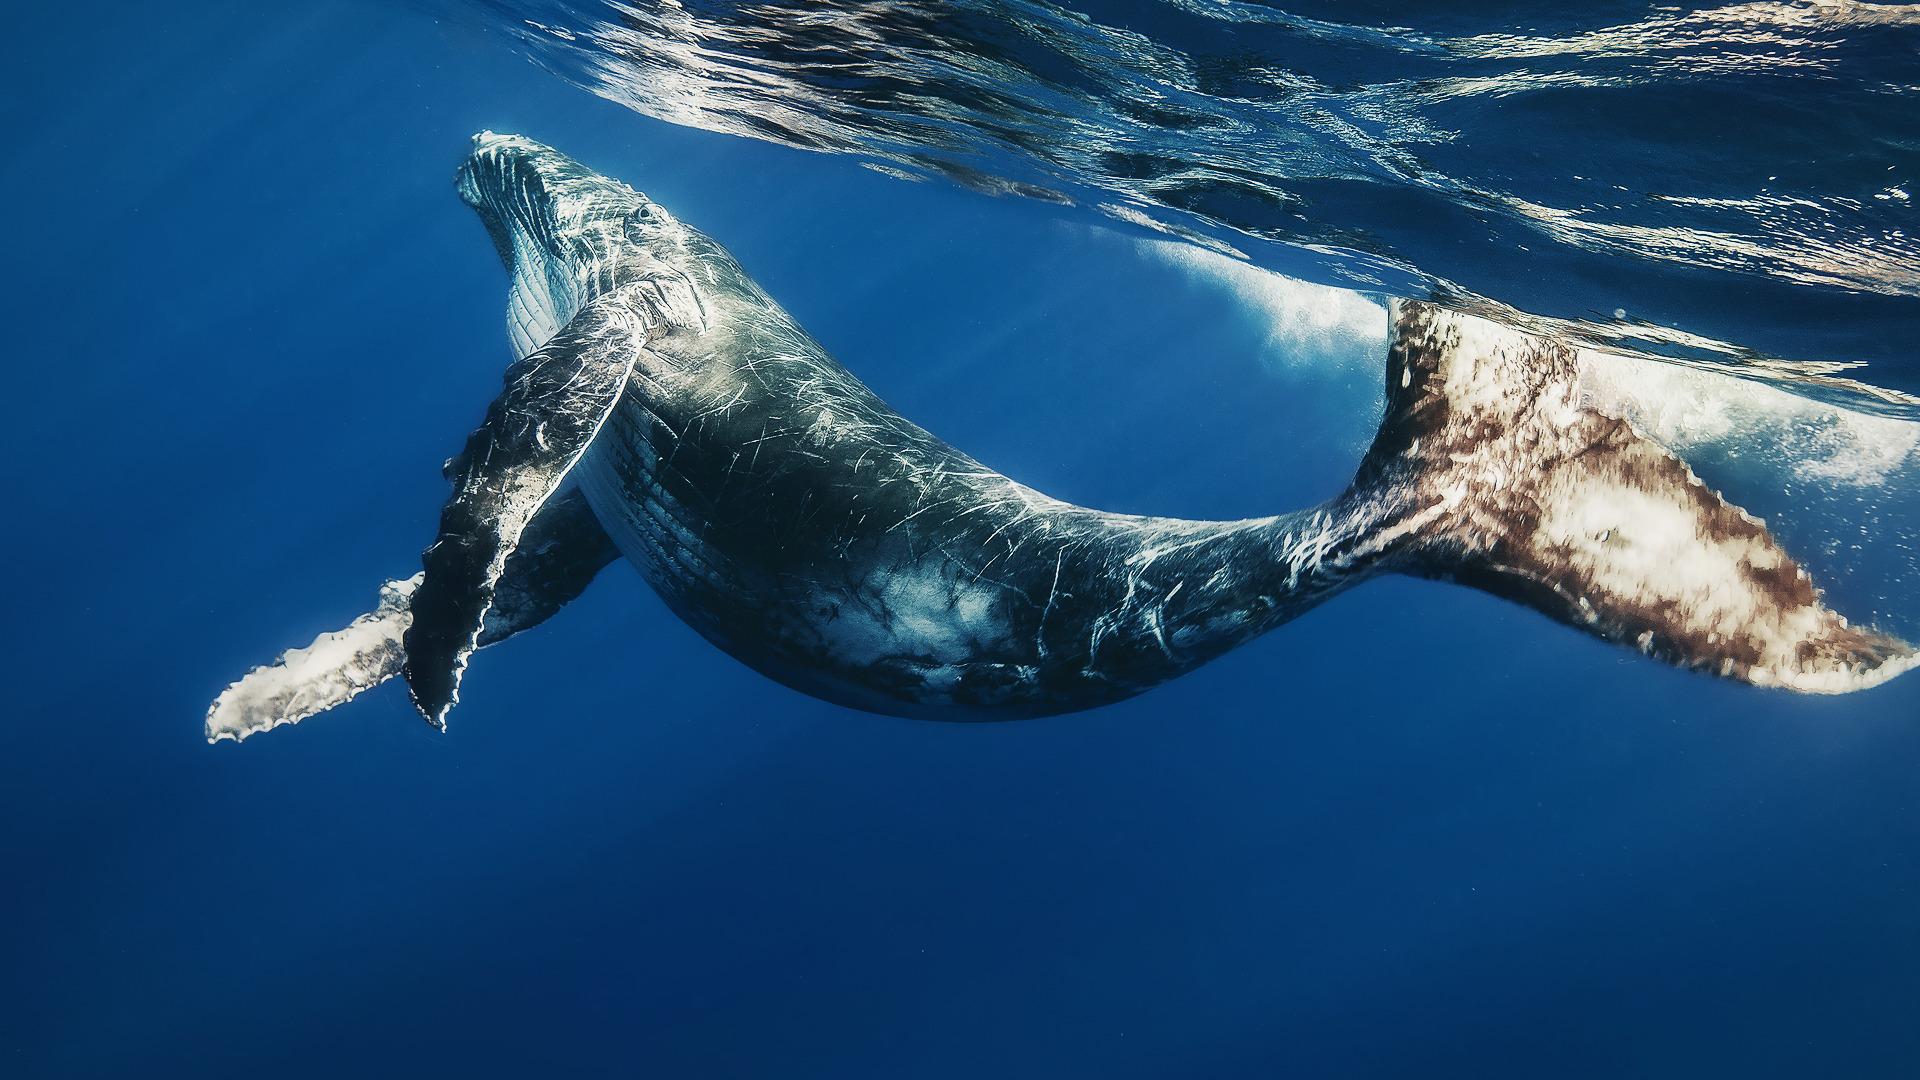 Картинки с китами на рабочий стол